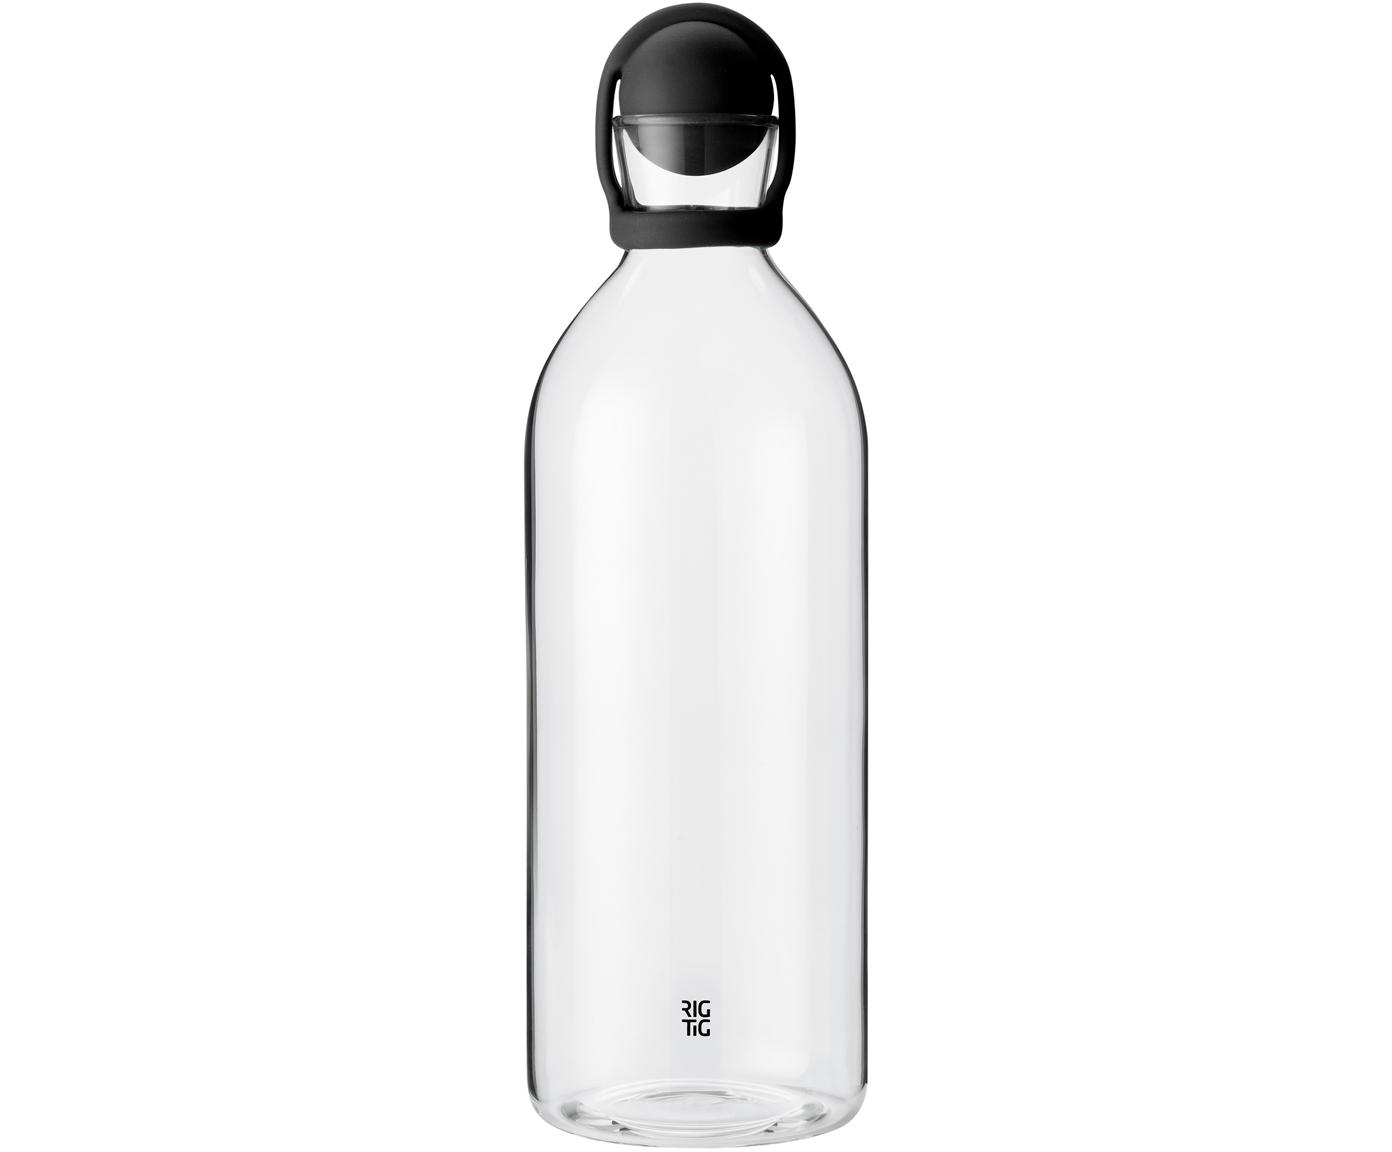 Wasserkaraffe Cool-It , Verschluss: Gummi, Schwarz,Transparent, 1.5 L